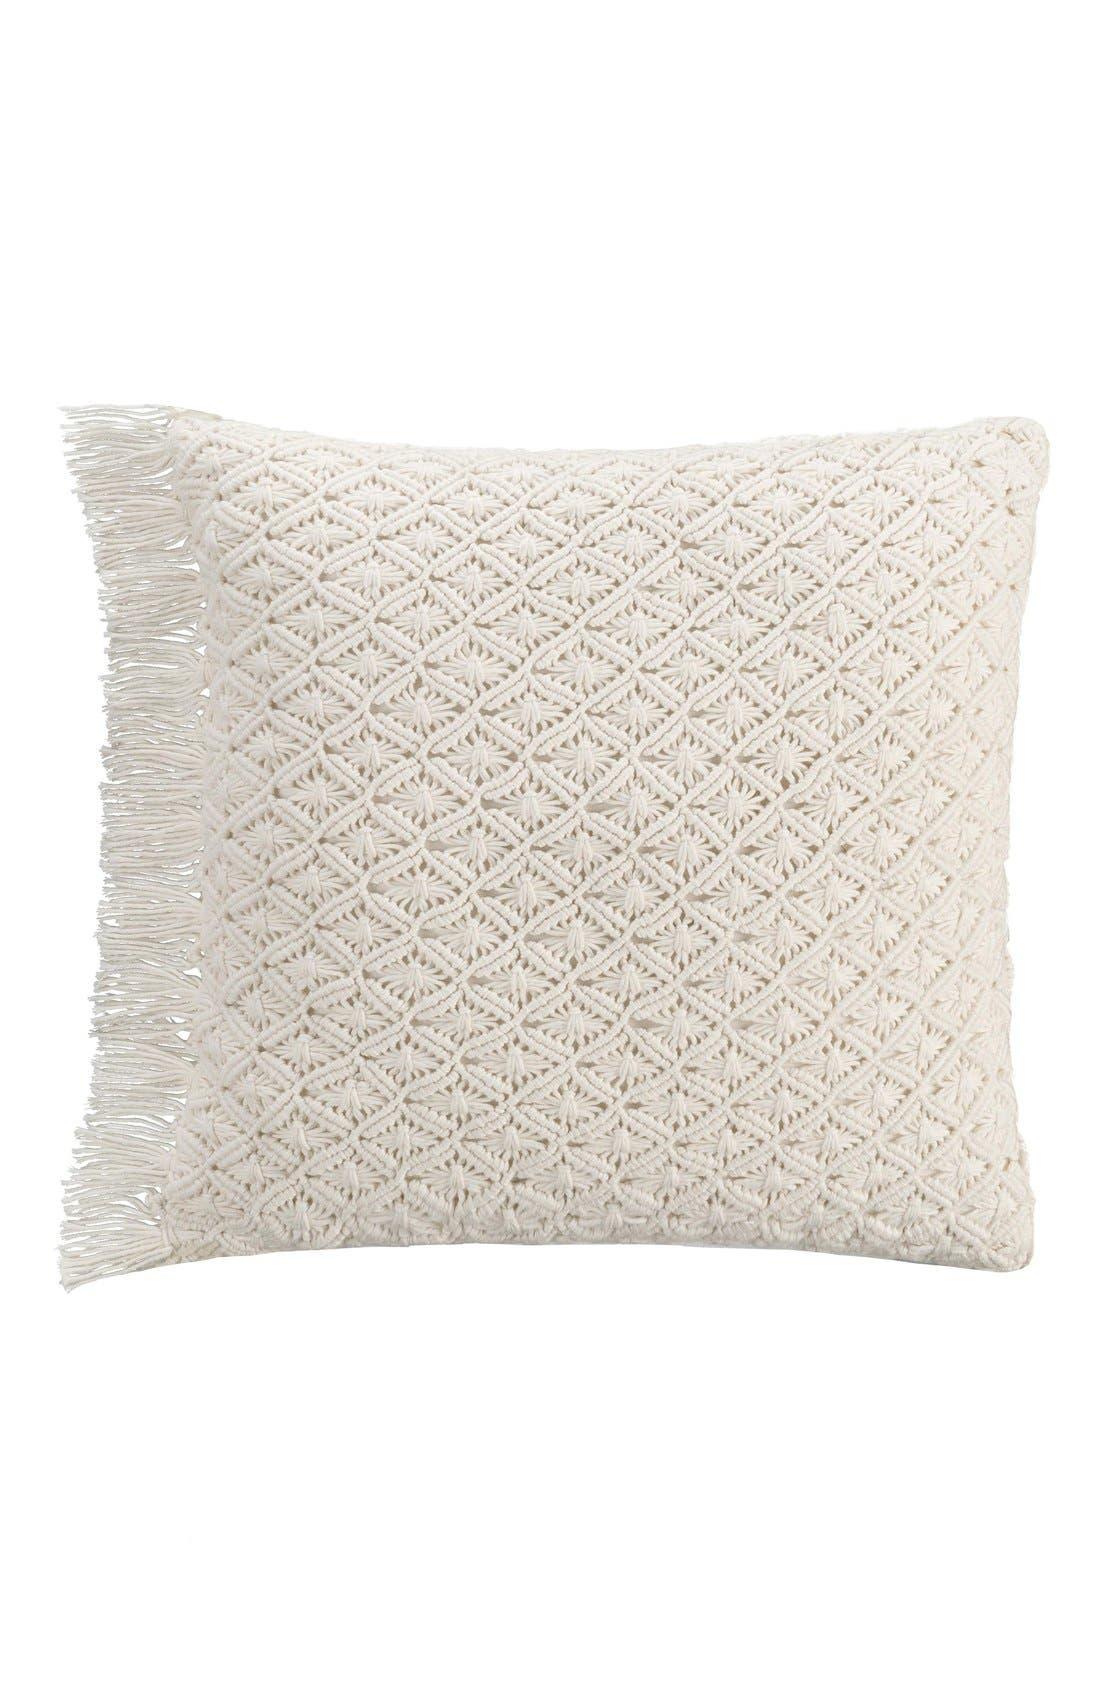 'Lace Medallion' Crochet Pillow,                         Main,                         color, Taupe